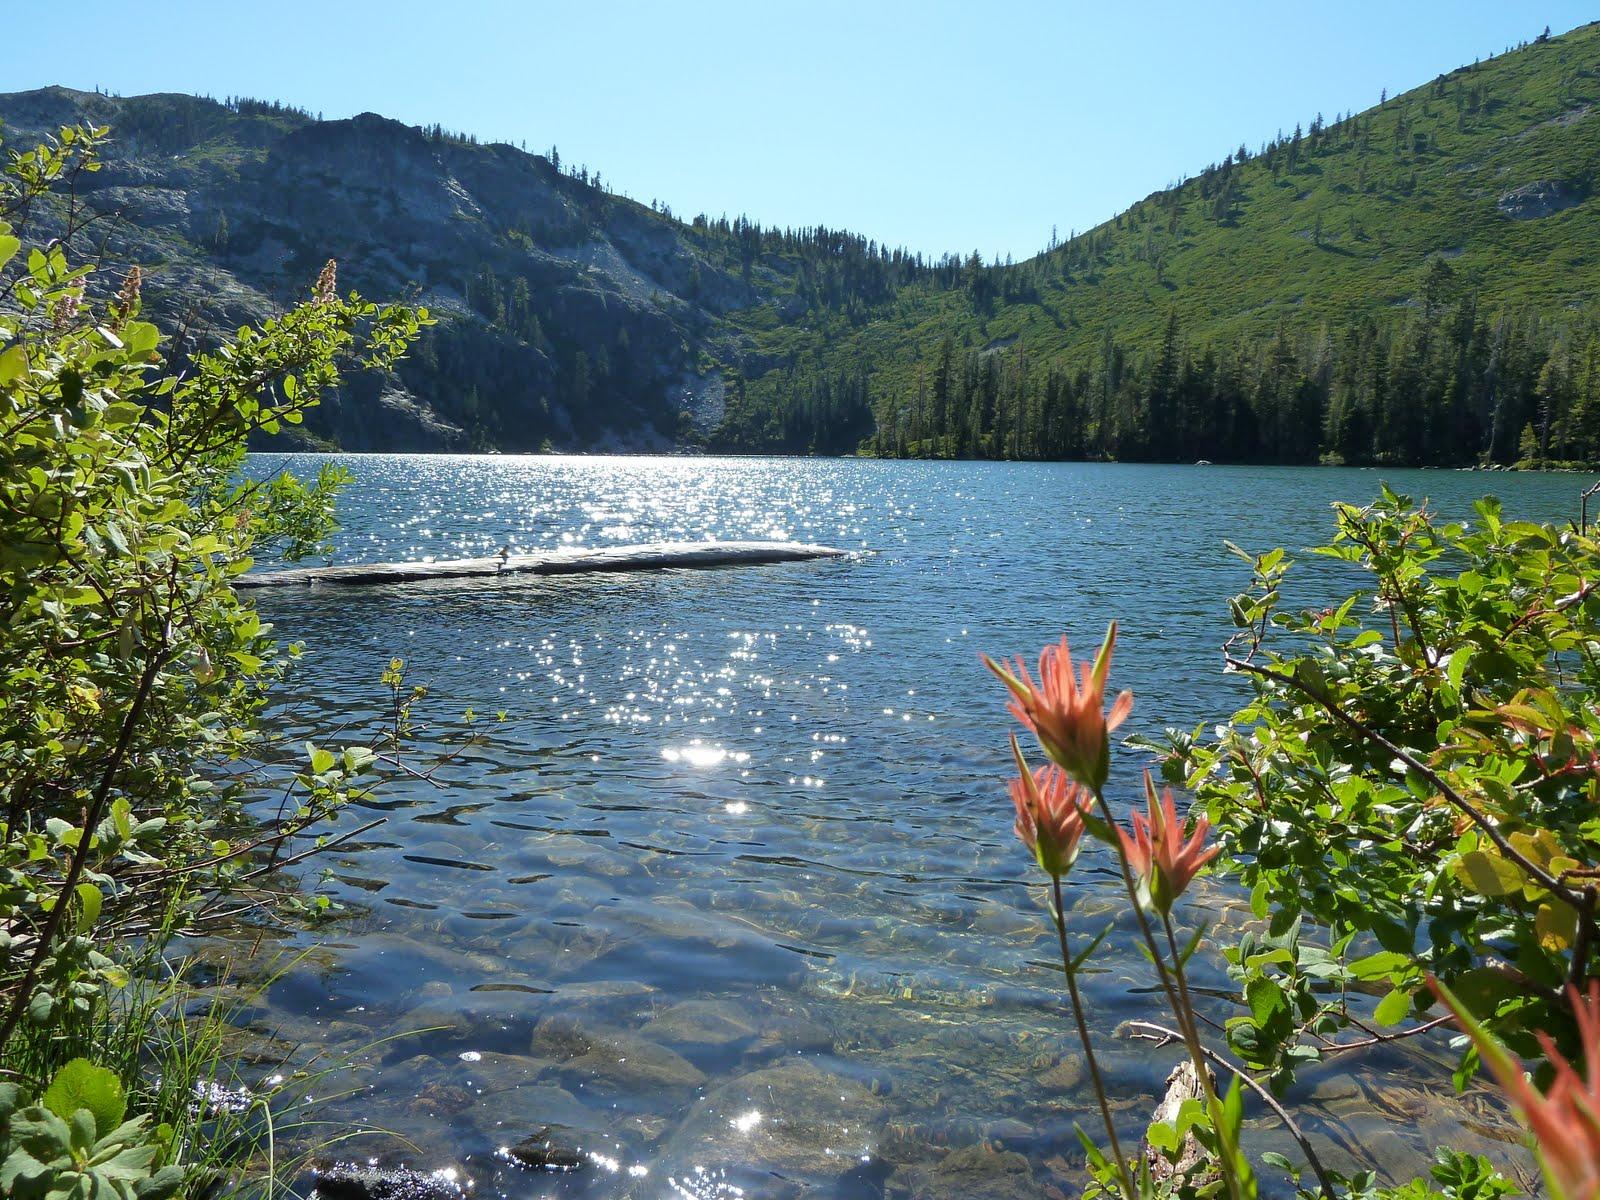 Lake siskiyou campground for Lake siskiyou resort cabins